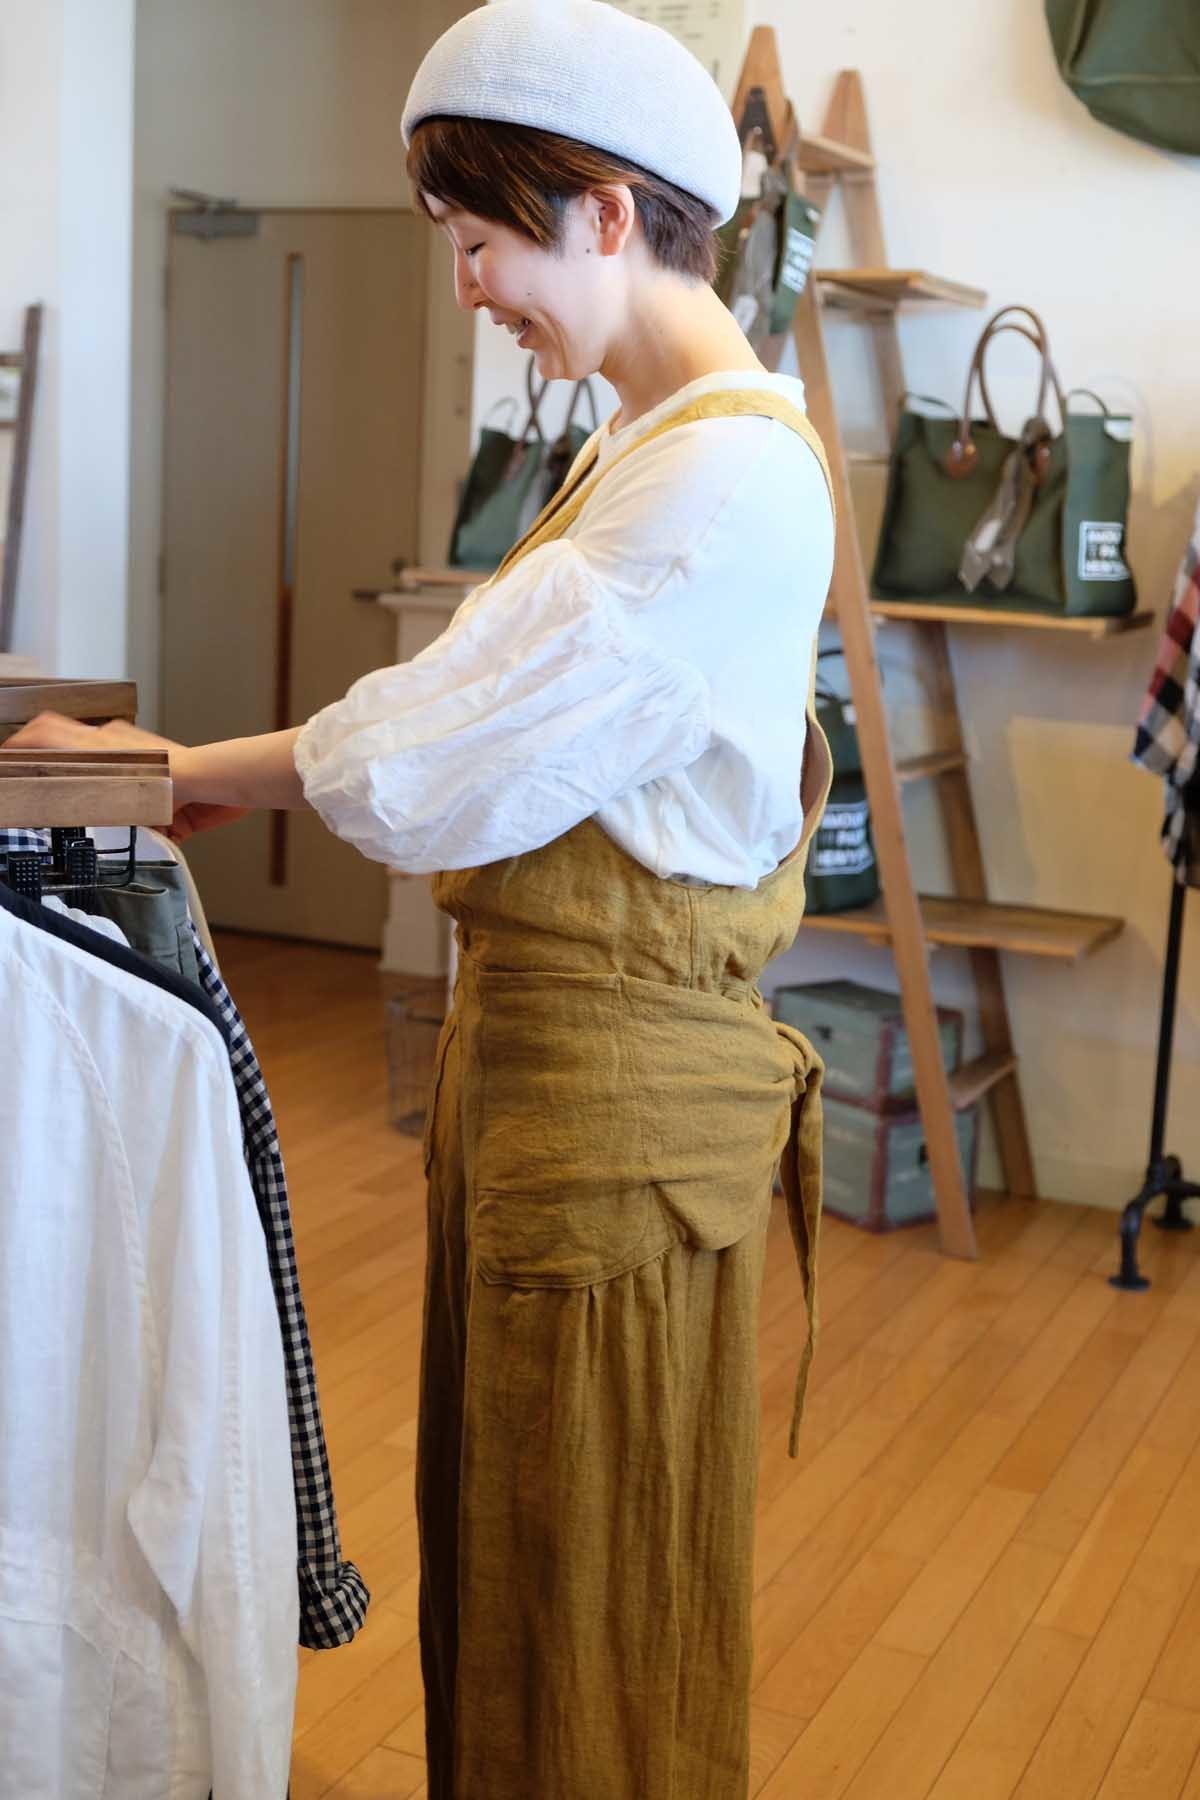 WEAR-フクトカオリを纏う- 洋服を纏う_c0359016_11512558.jpg